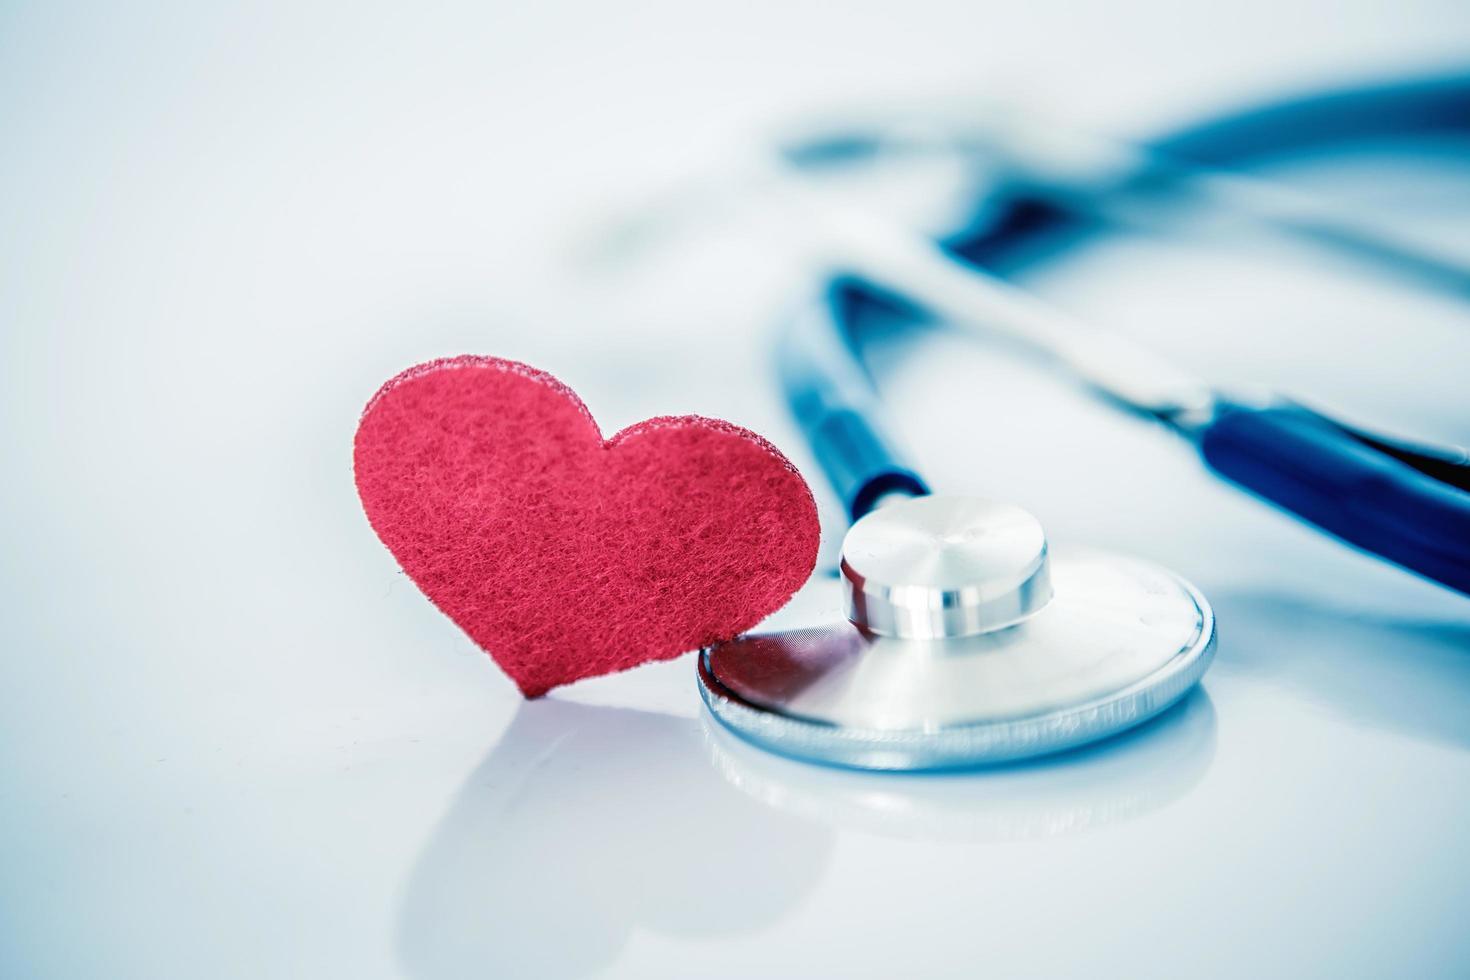 Conceptual image showing medical stethoscope photo